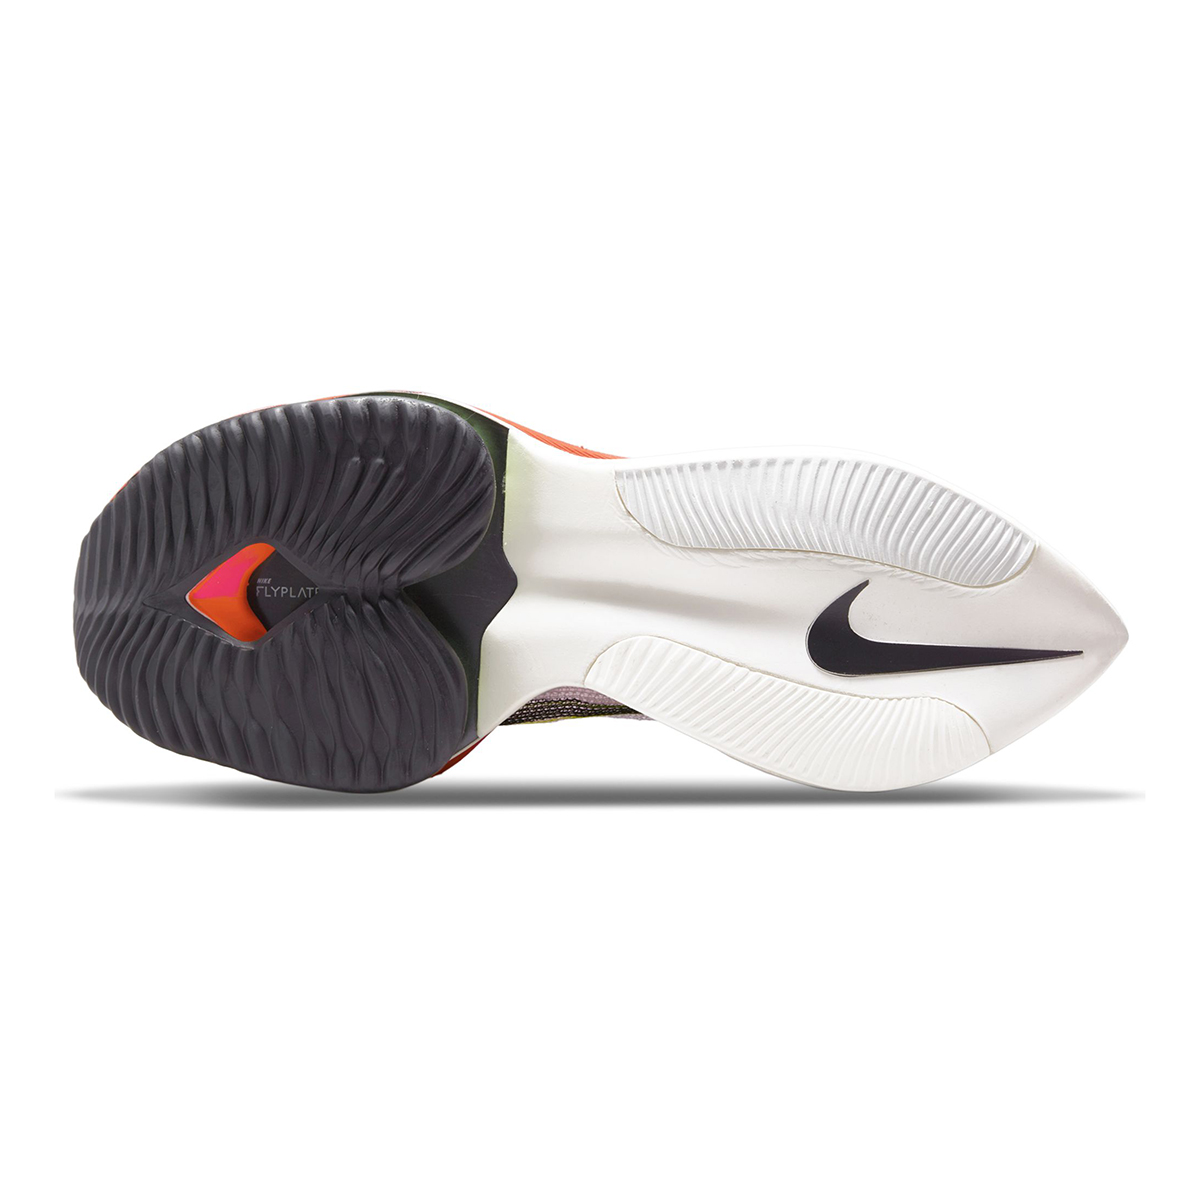 Men's Nike Air Zoom Alphafly Next% Flyknit Running Shoe - Color: Rawdacious - Size: 6 - Width: Regular, Rawdacious, large, image 3